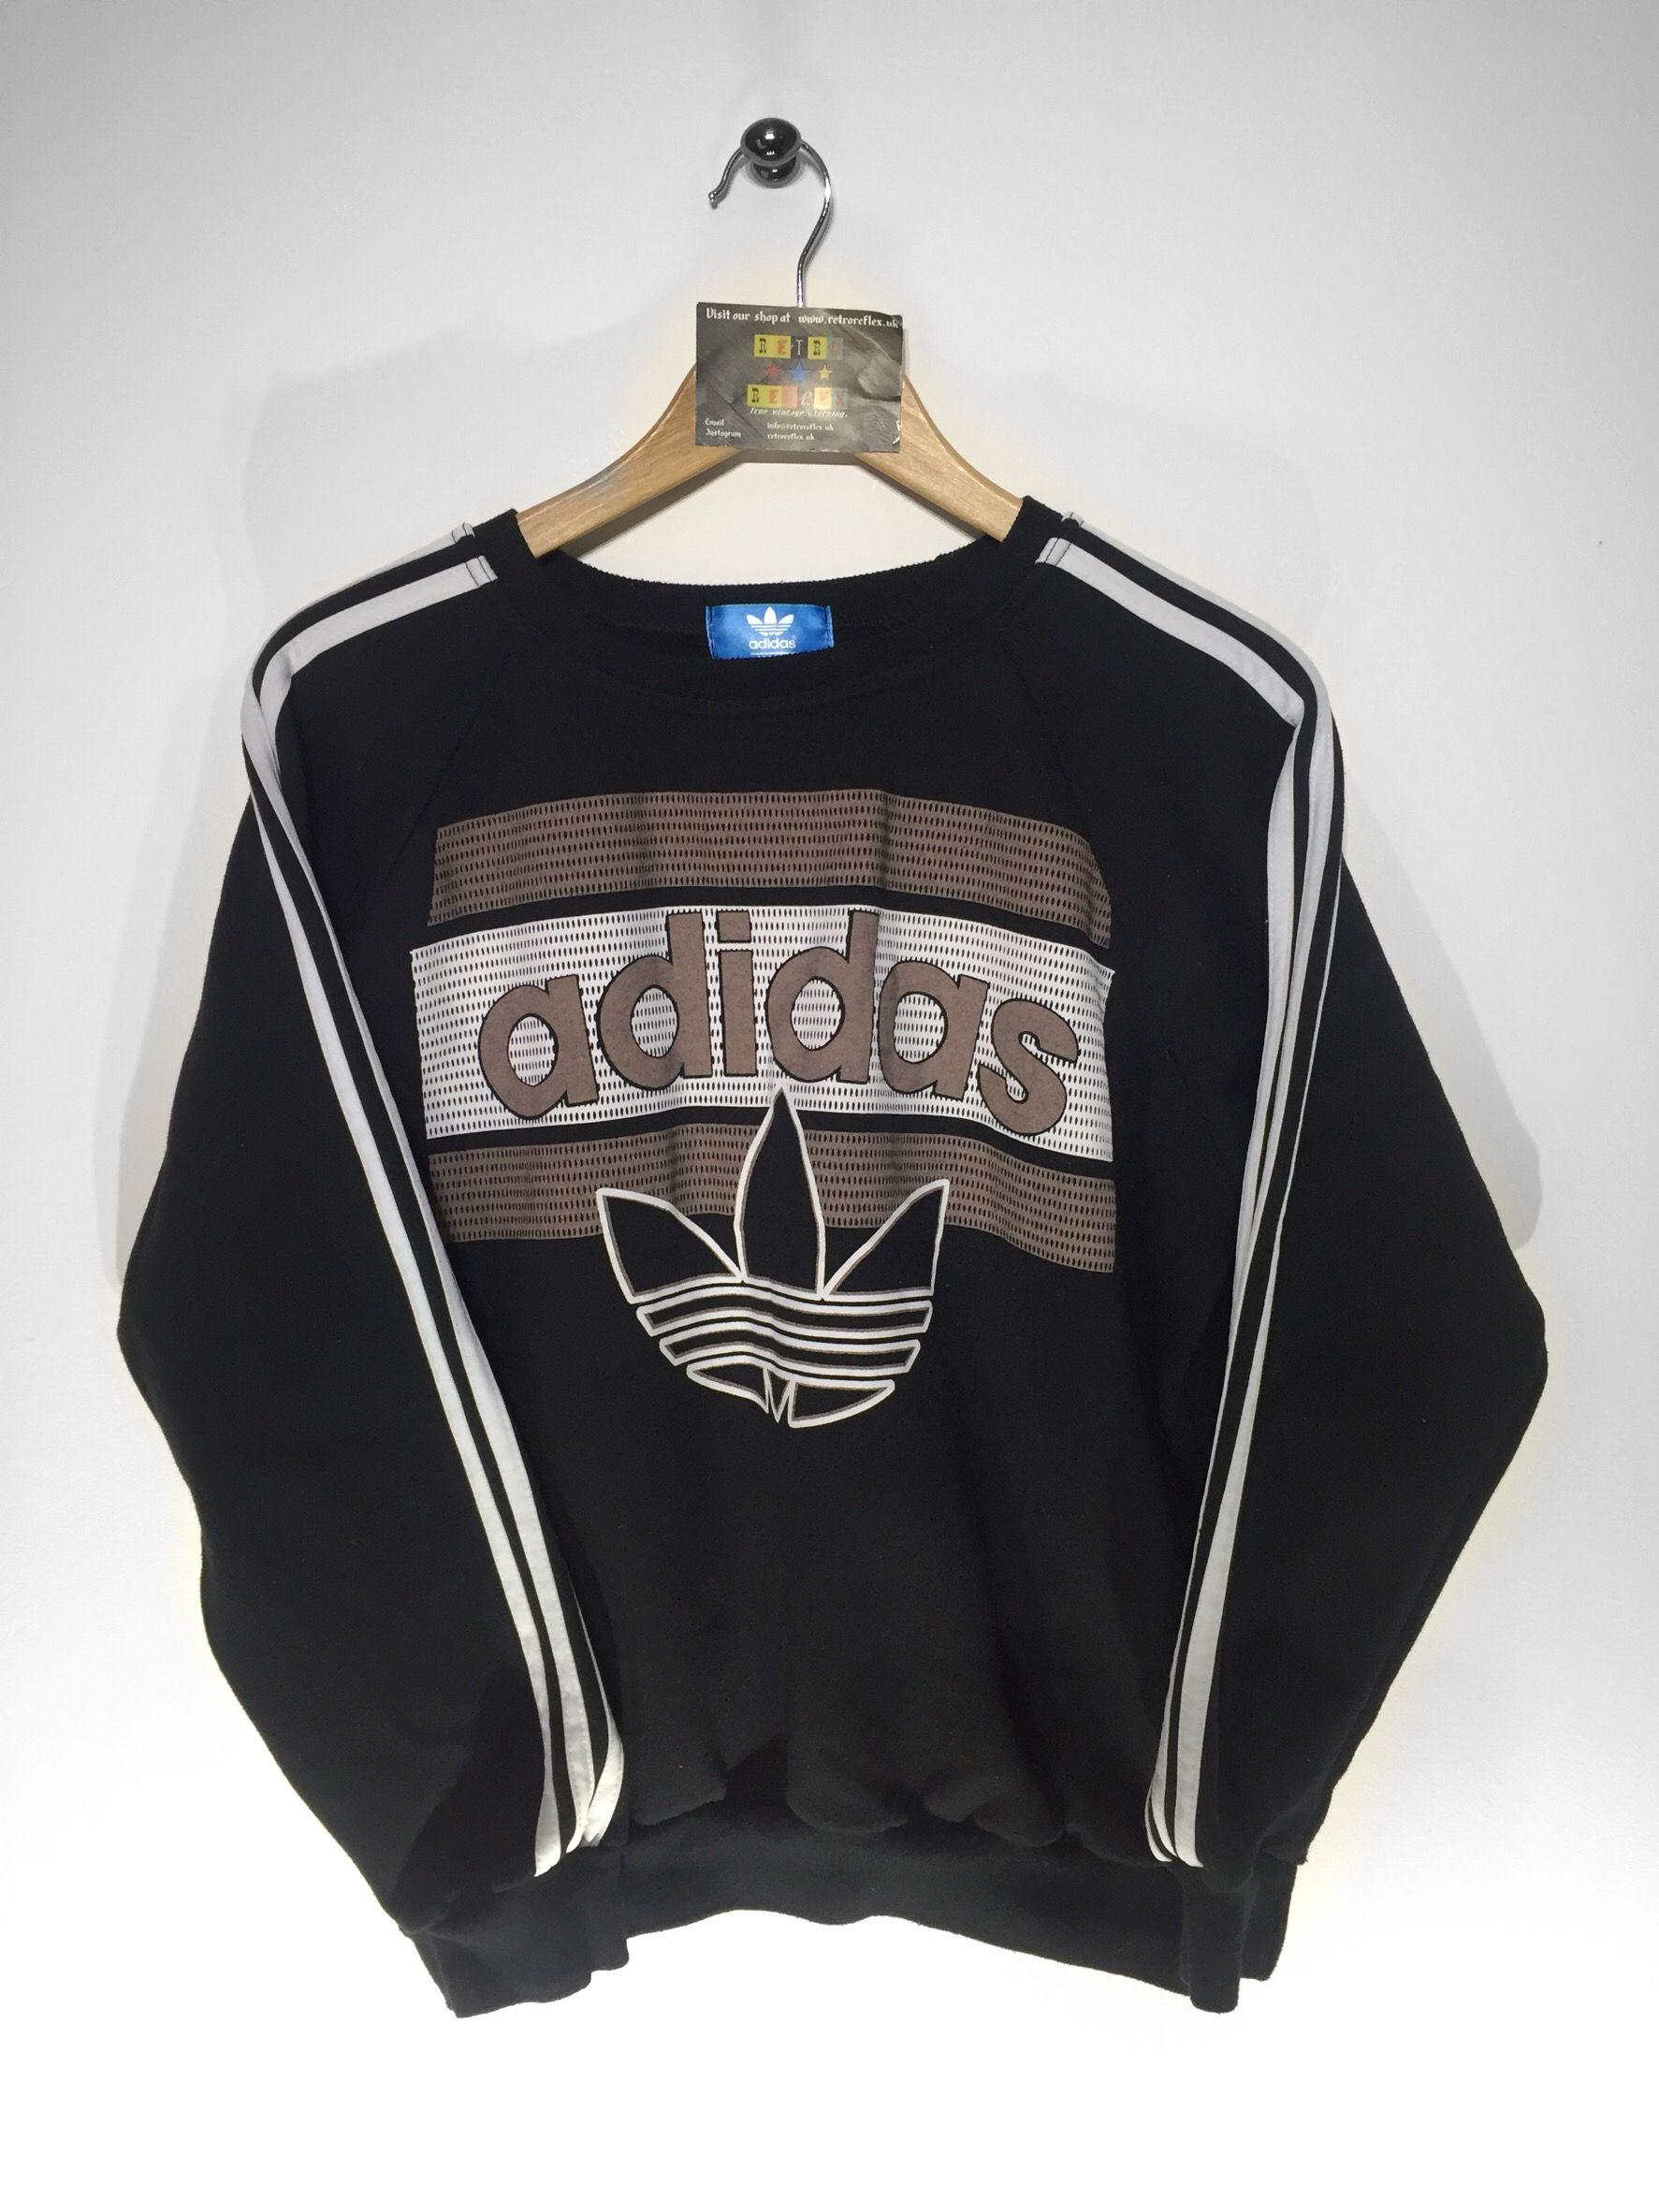 Adidas Originals trefoil Block It Out Crew Neck Sweatshirt